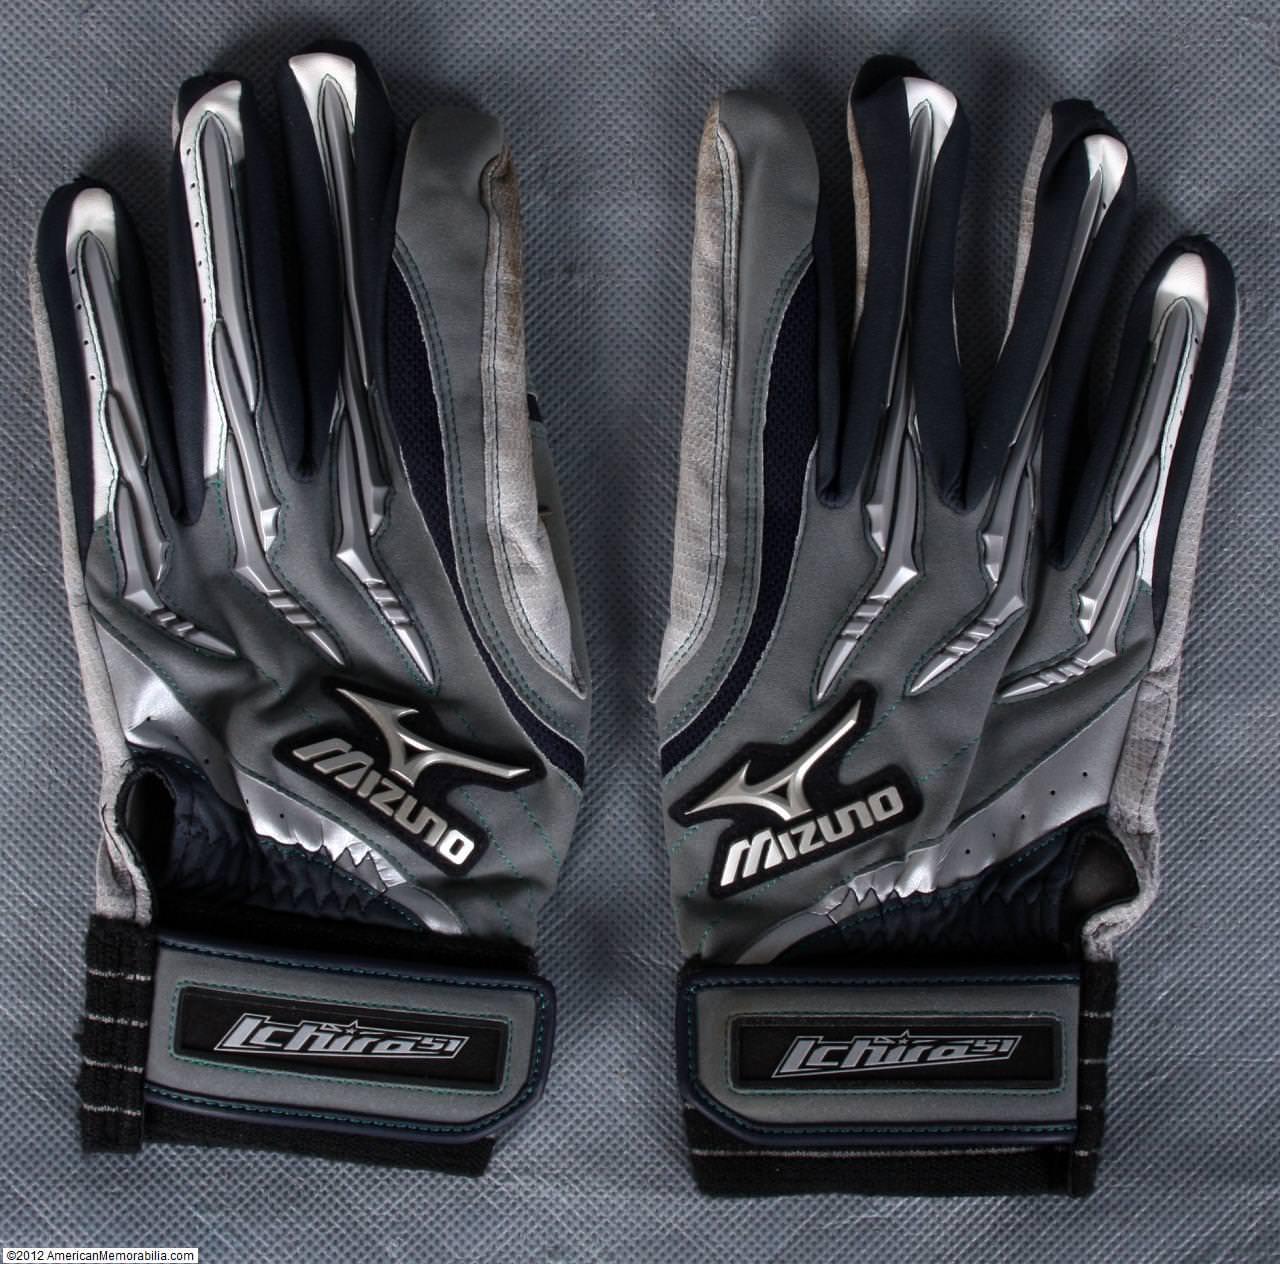 Mizuno Pro Limited Black Mizuno Pro Limited Batting